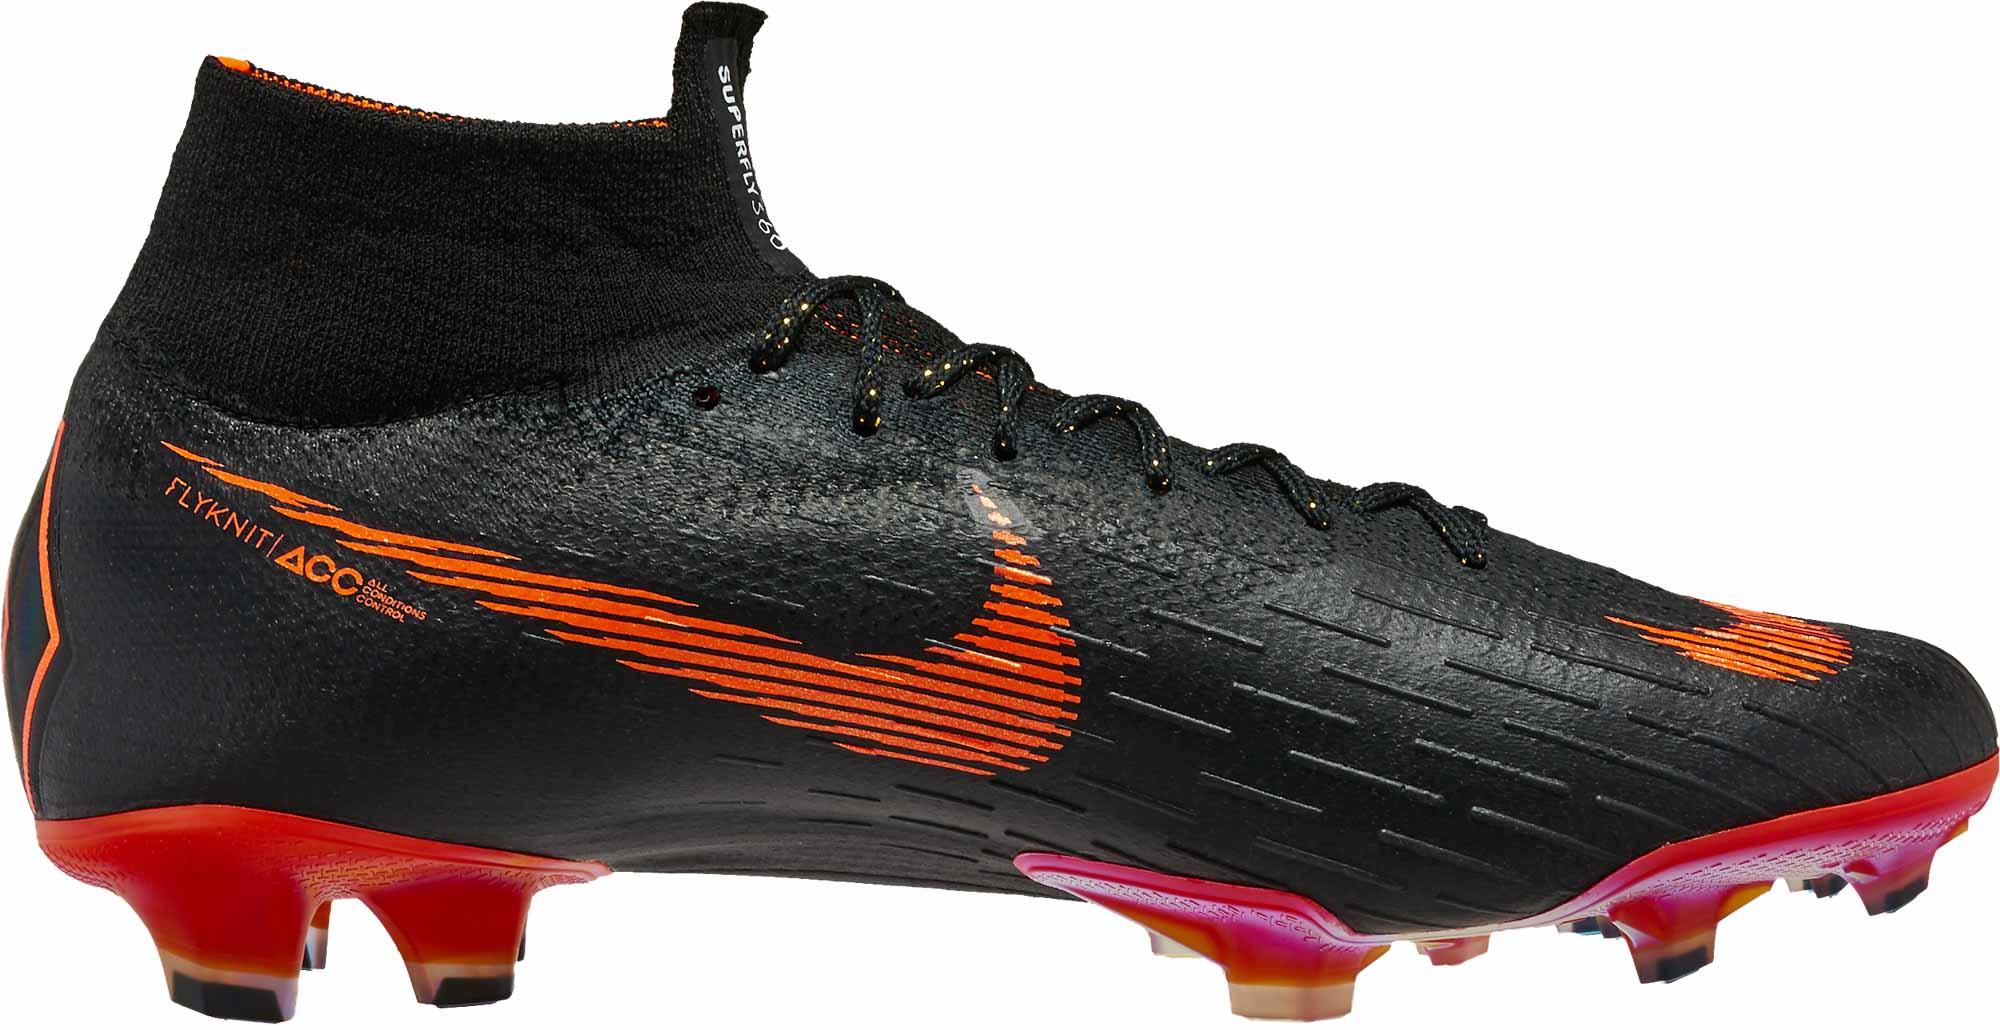 online retailer 9a9b6 6f400 Nike Superfly 6 Elite FG - Black & Total Orange - Soccer Master